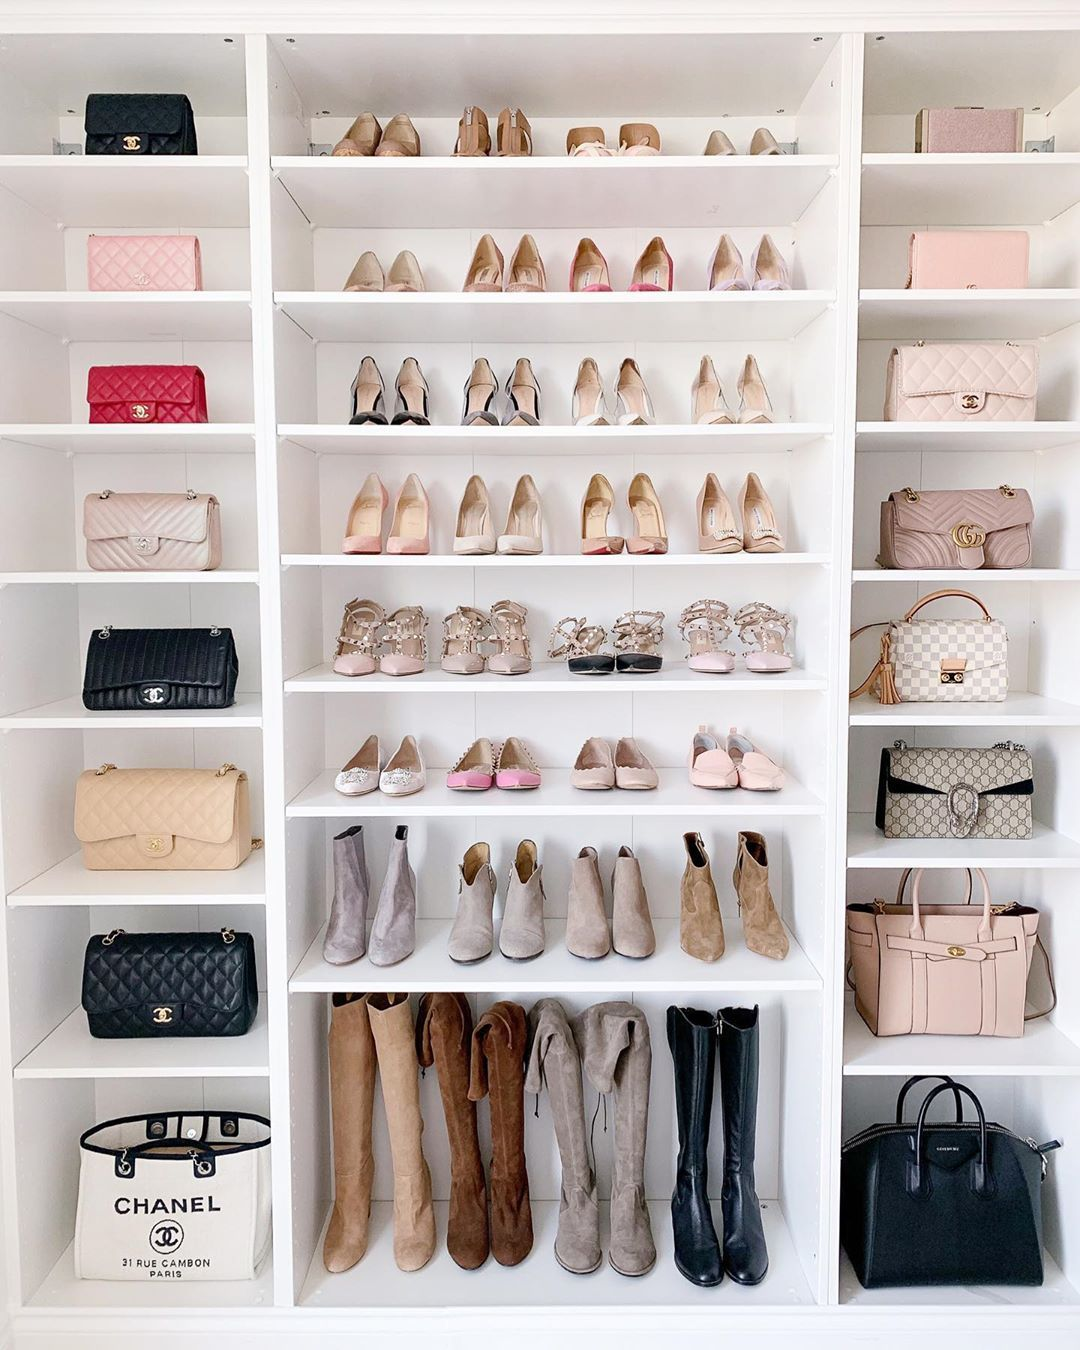 Louis Vuitton Trapeze Bag Closet Designs Walk In Closet Design